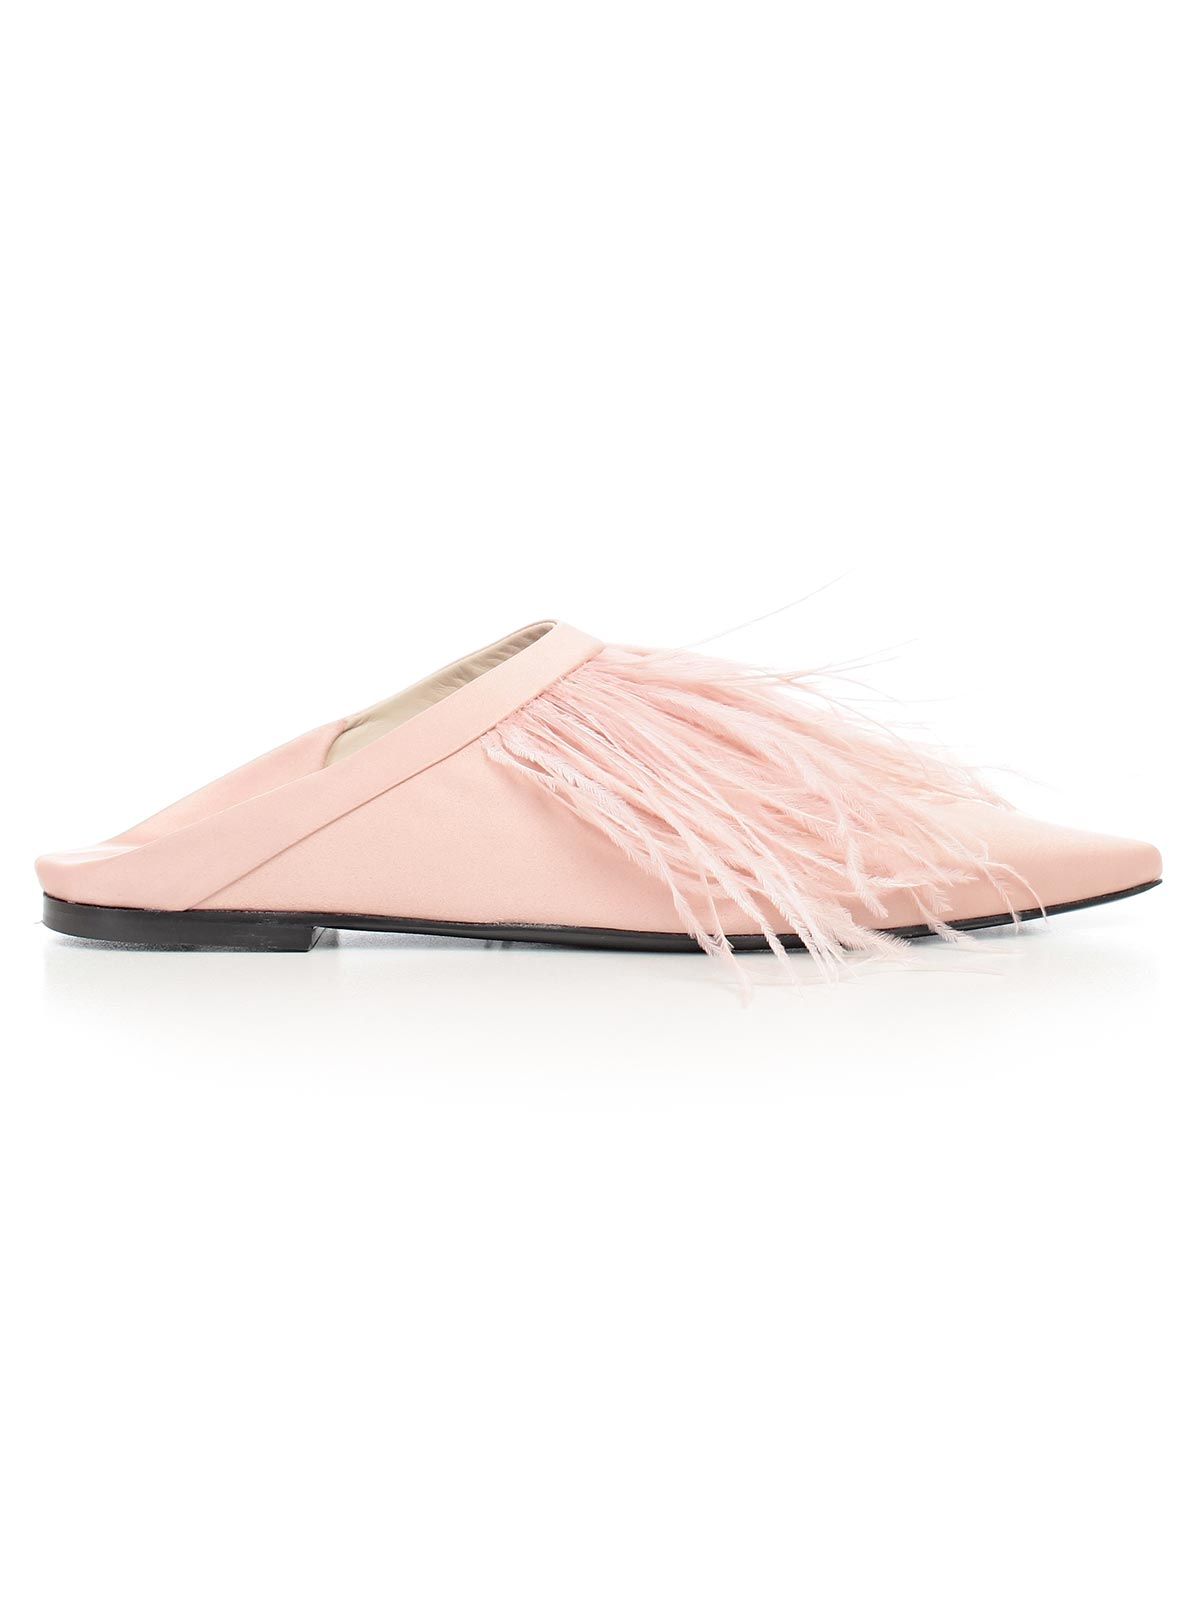 Picture of Erika Cavallini Footwear